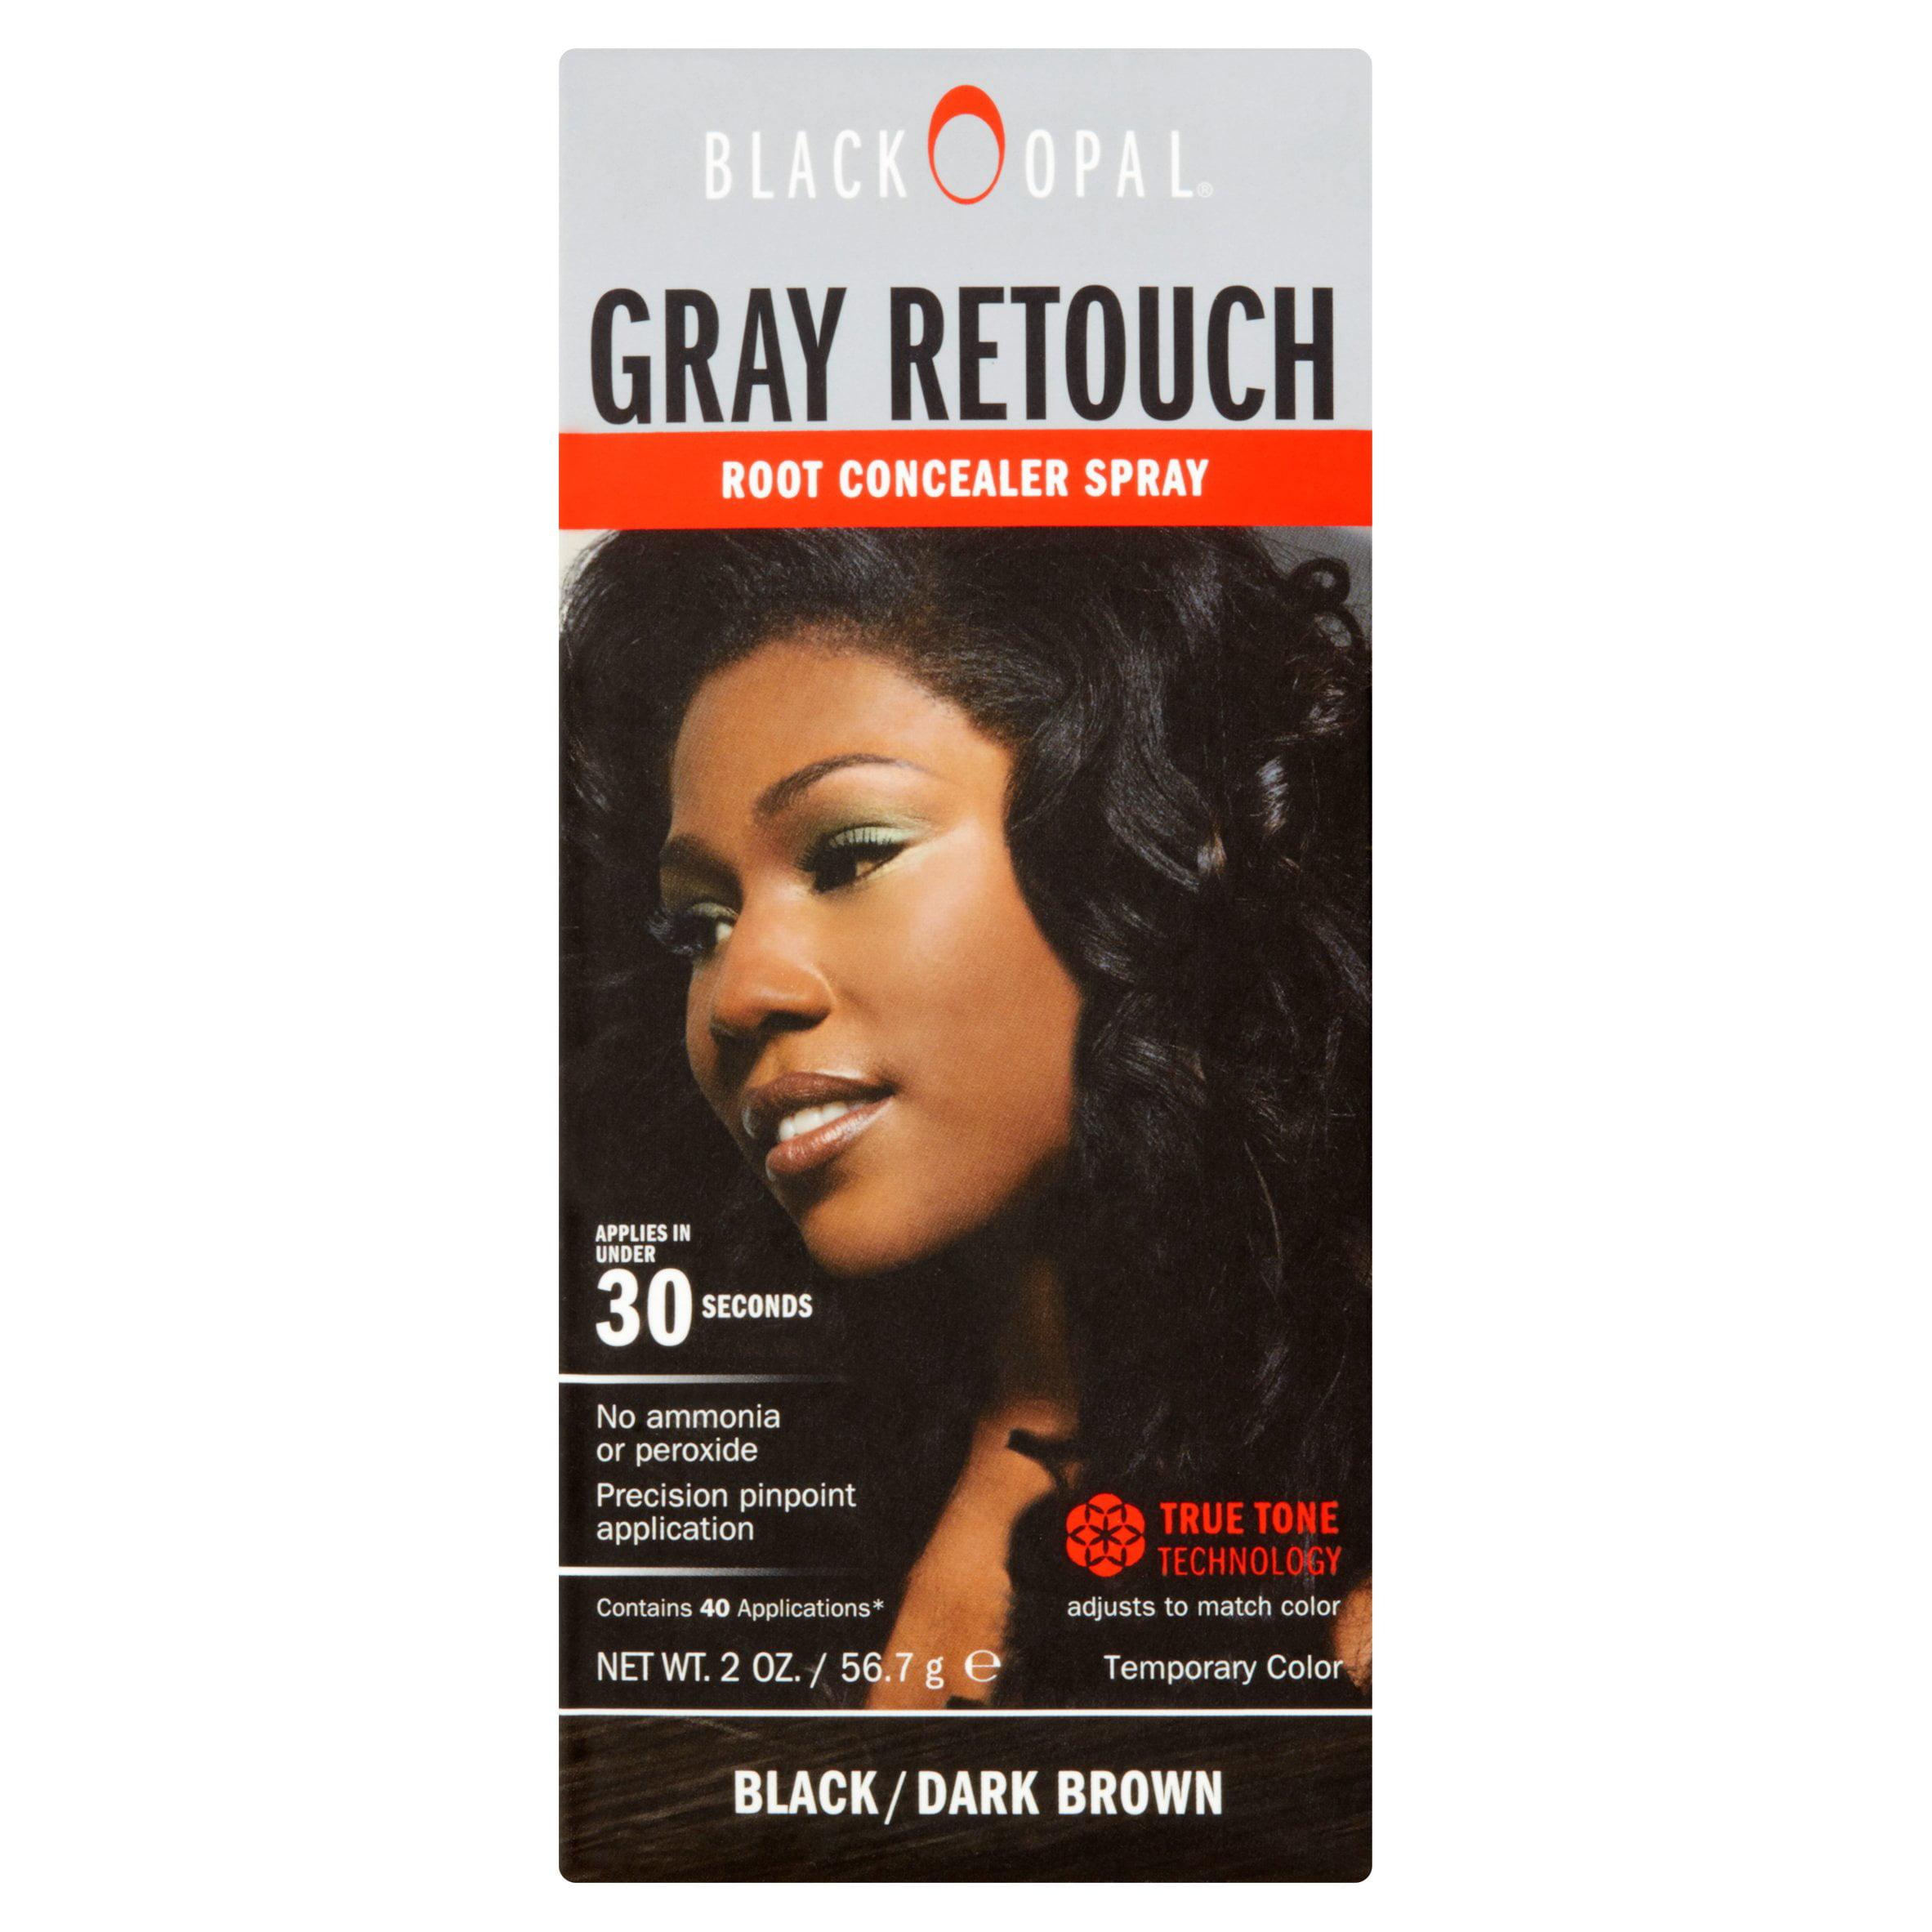 Black Opal Gray Retouch Root Concealer Spray Blackdark Brown 2 Oz